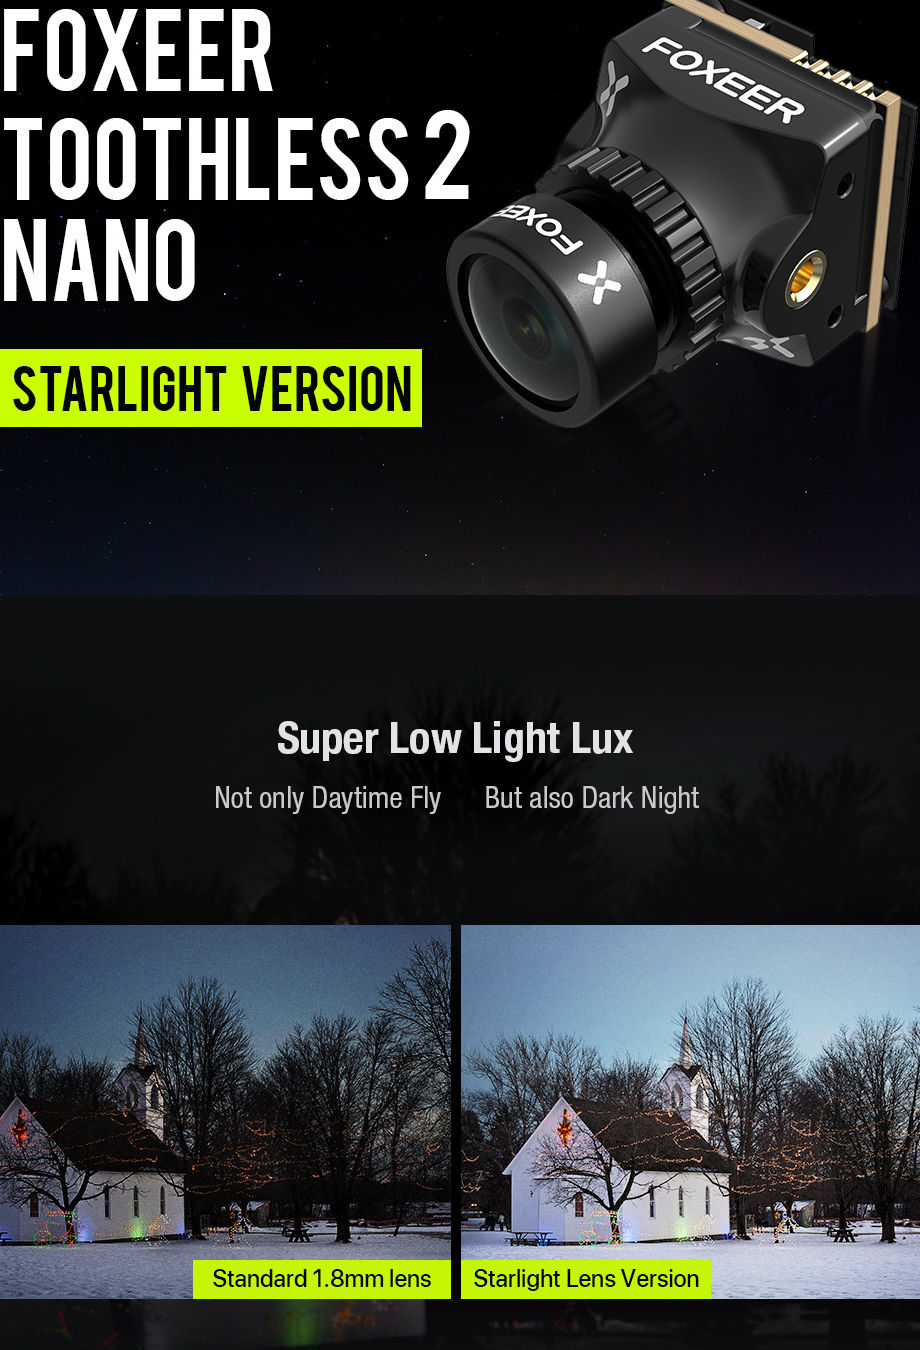 Foxeer Nano Toothless 2 StarLight